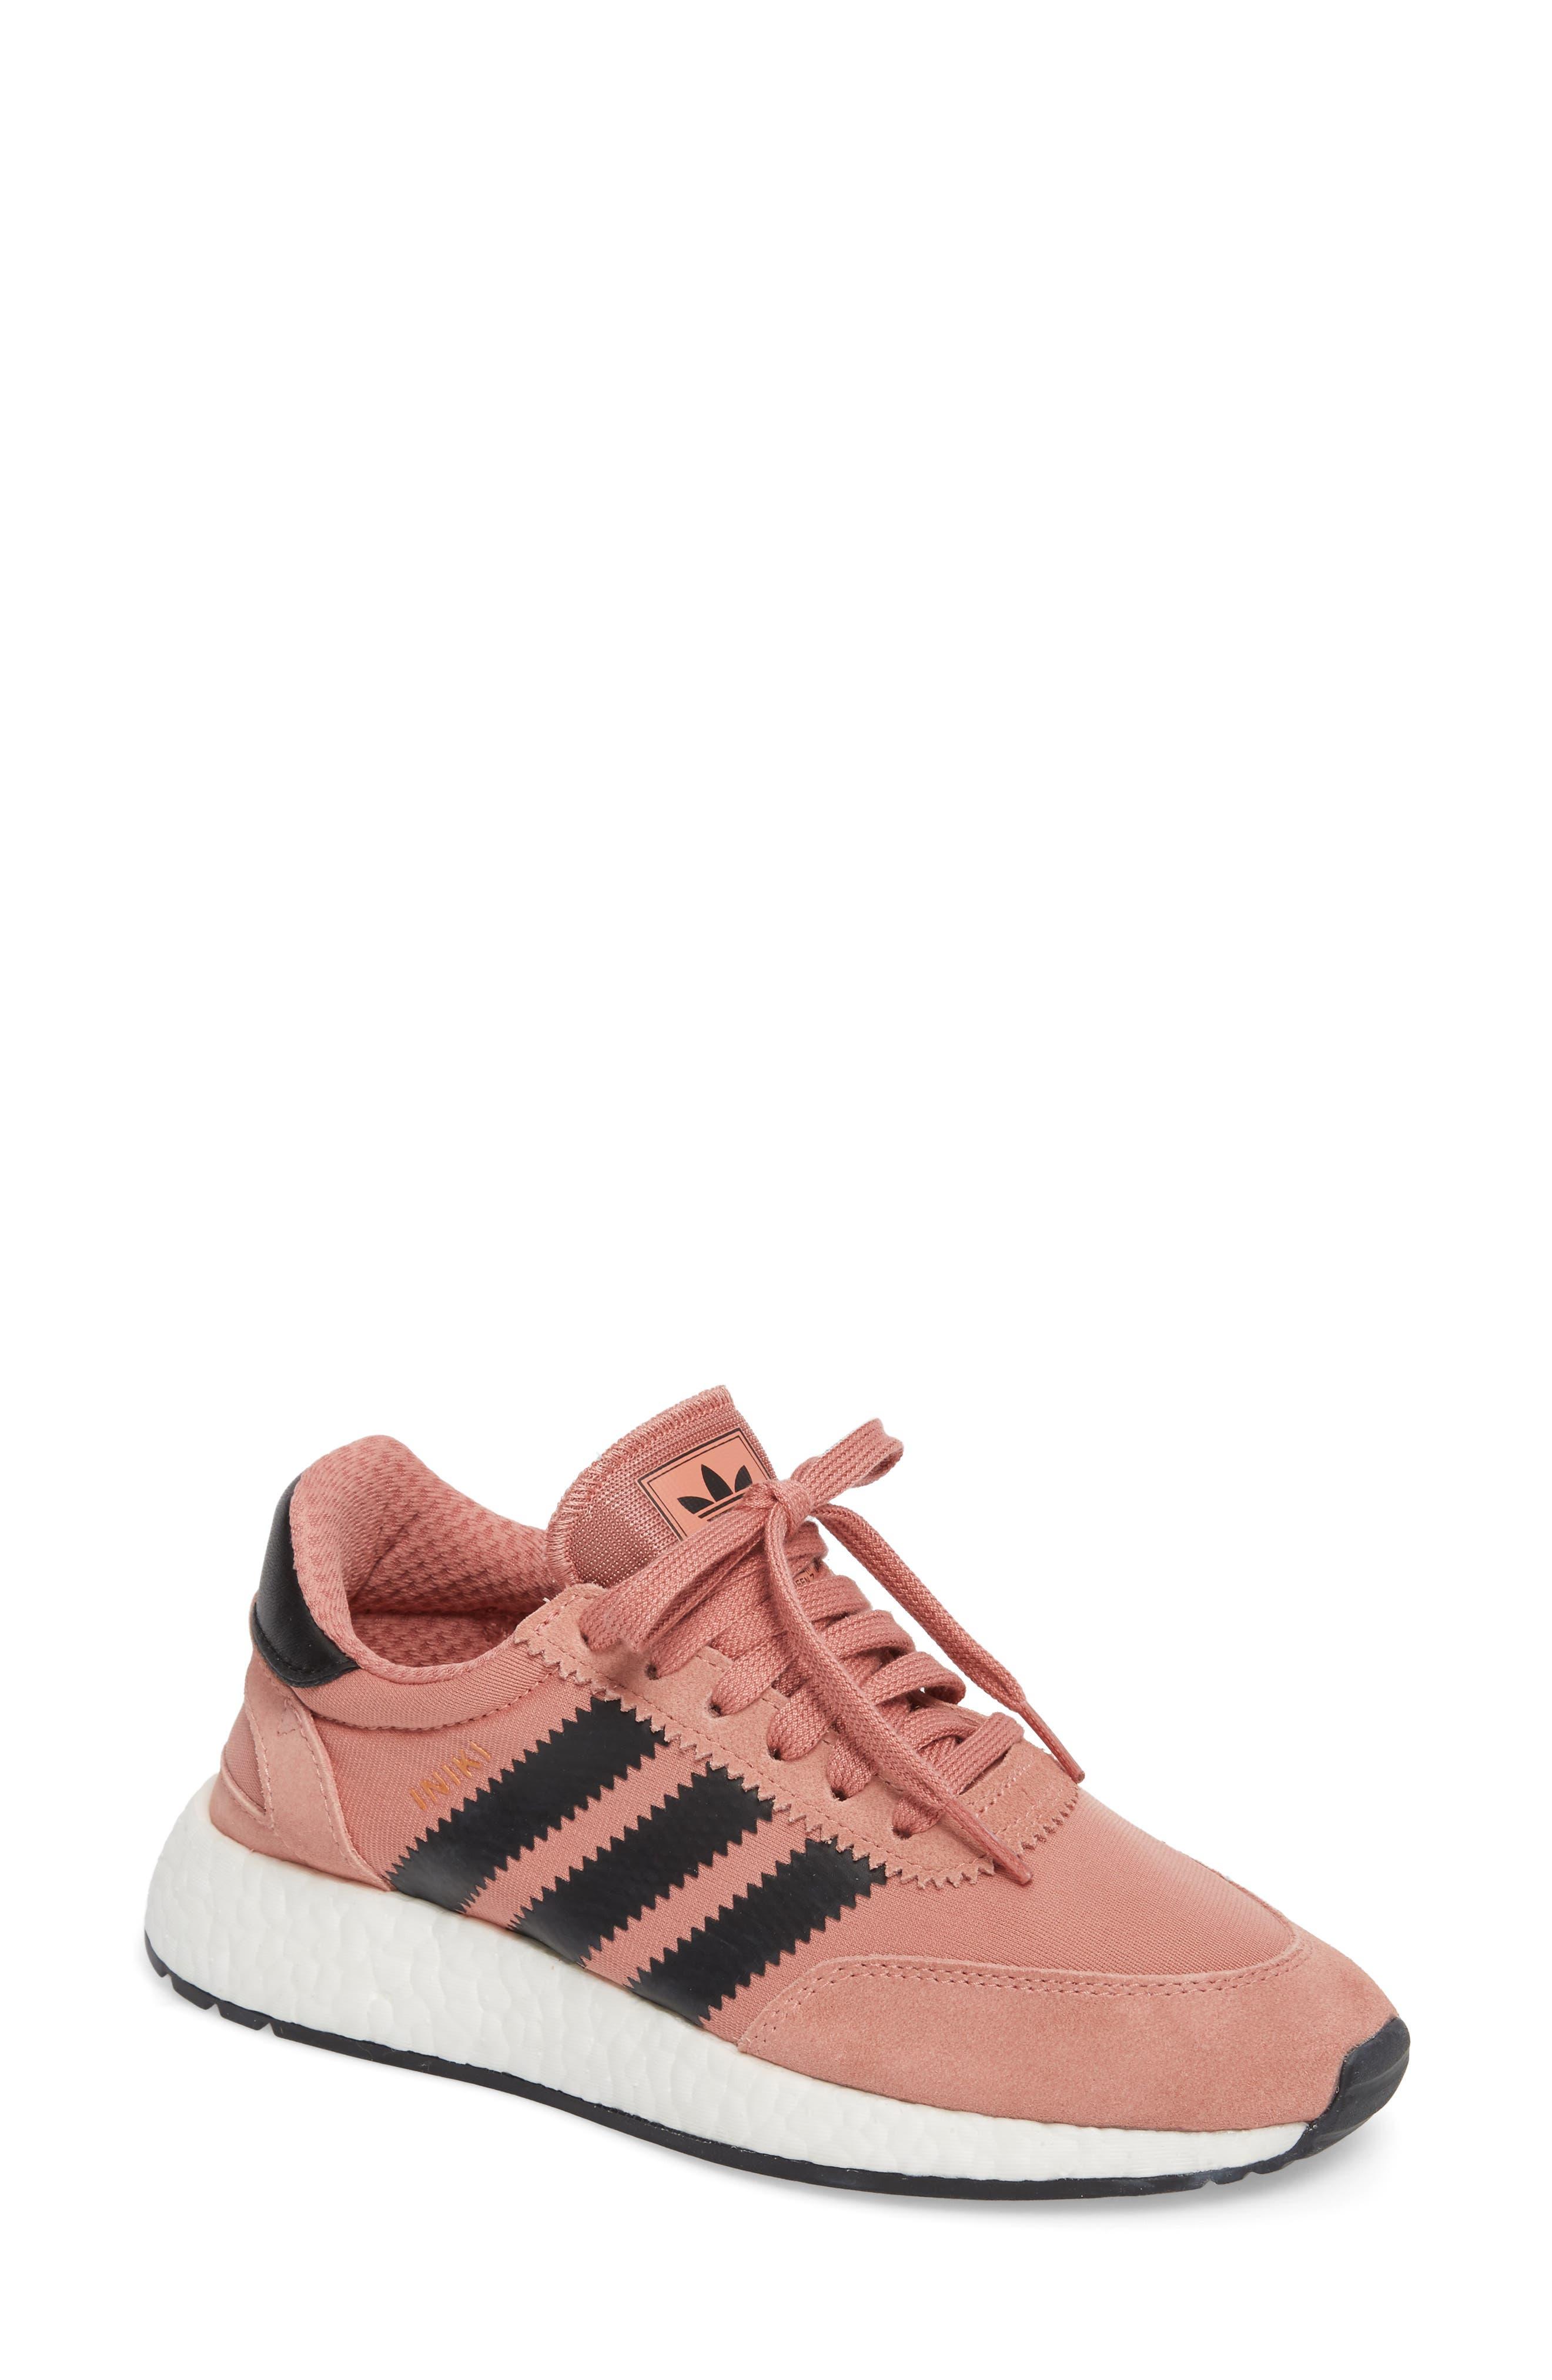 adidas I-5923 Sneaker (Women)